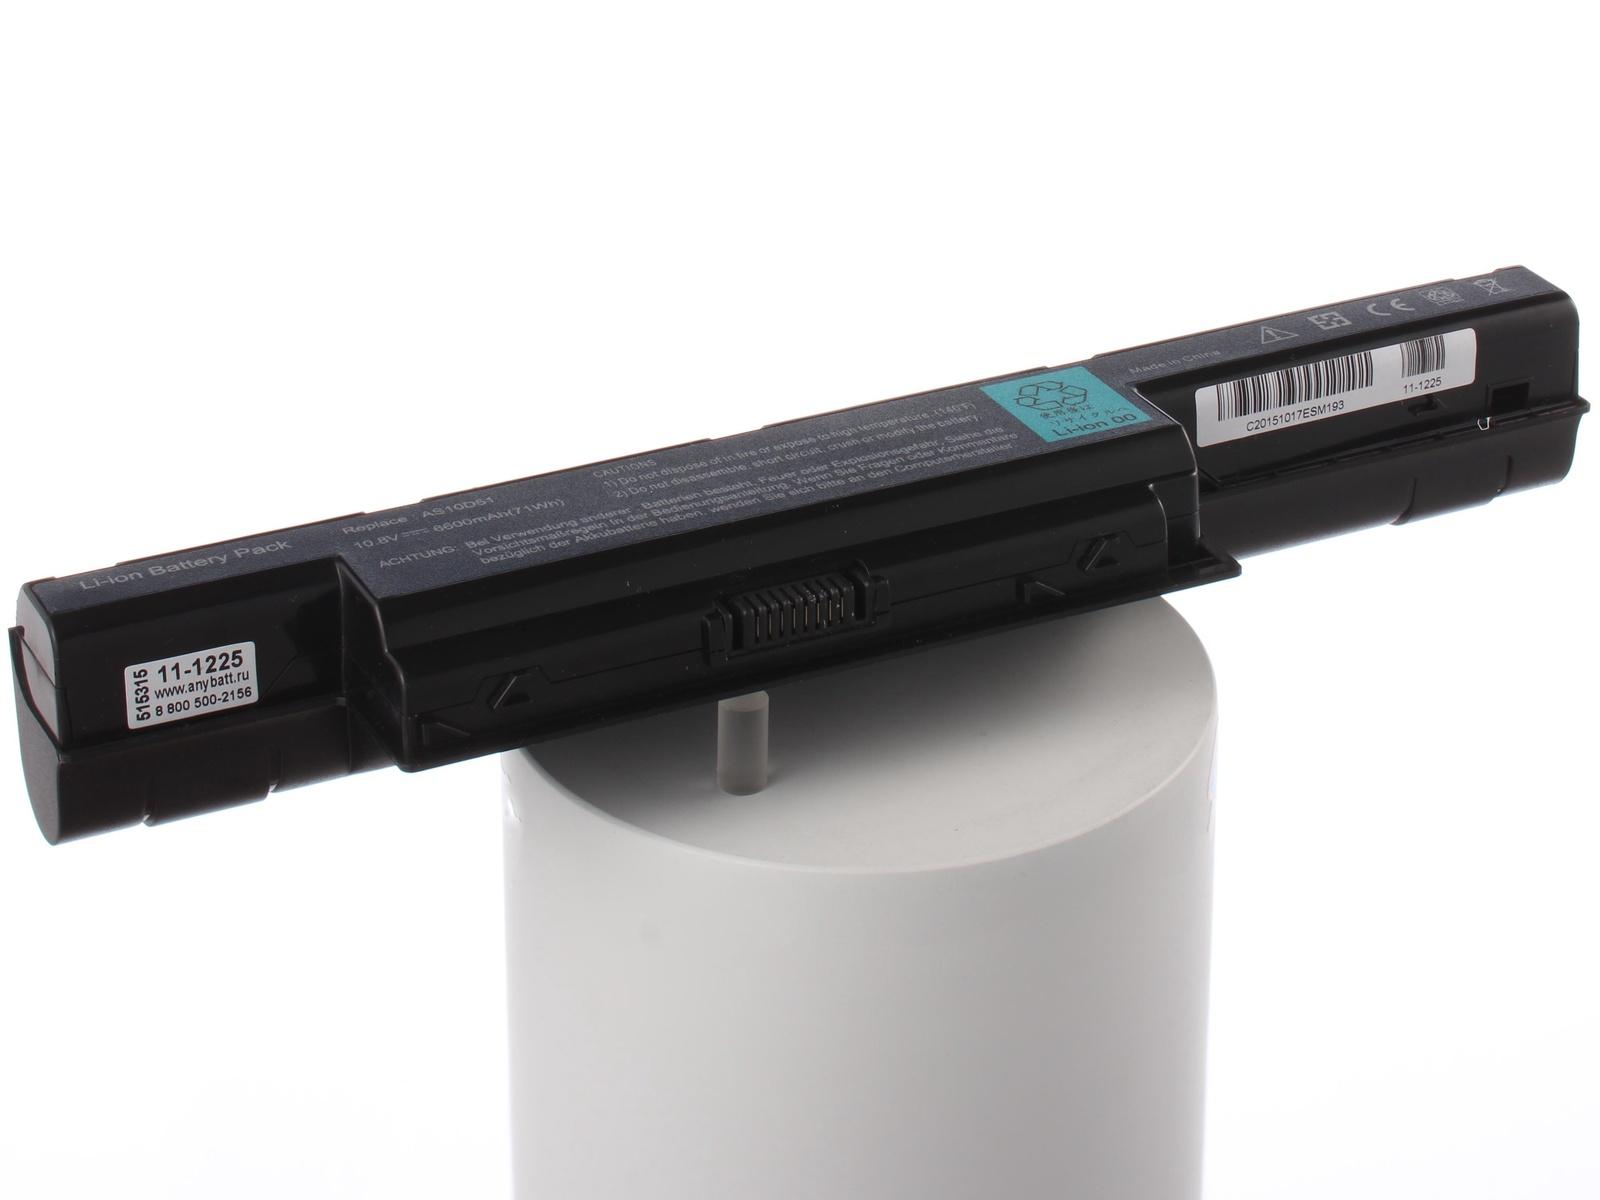 Аккумулятор для ноутбука AnyBatt для Acer Aspire V3-771-32324G50Makk, Aspire V3-771G-53238G75Ma, Aspire V3-772G-54206G1TMa, Aspire V3-772G-54206G1TMamm, Aspire V3-772G-54208G1TMamm, Aspire V3-772G-54216G1TMa недорго, оригинальная цена